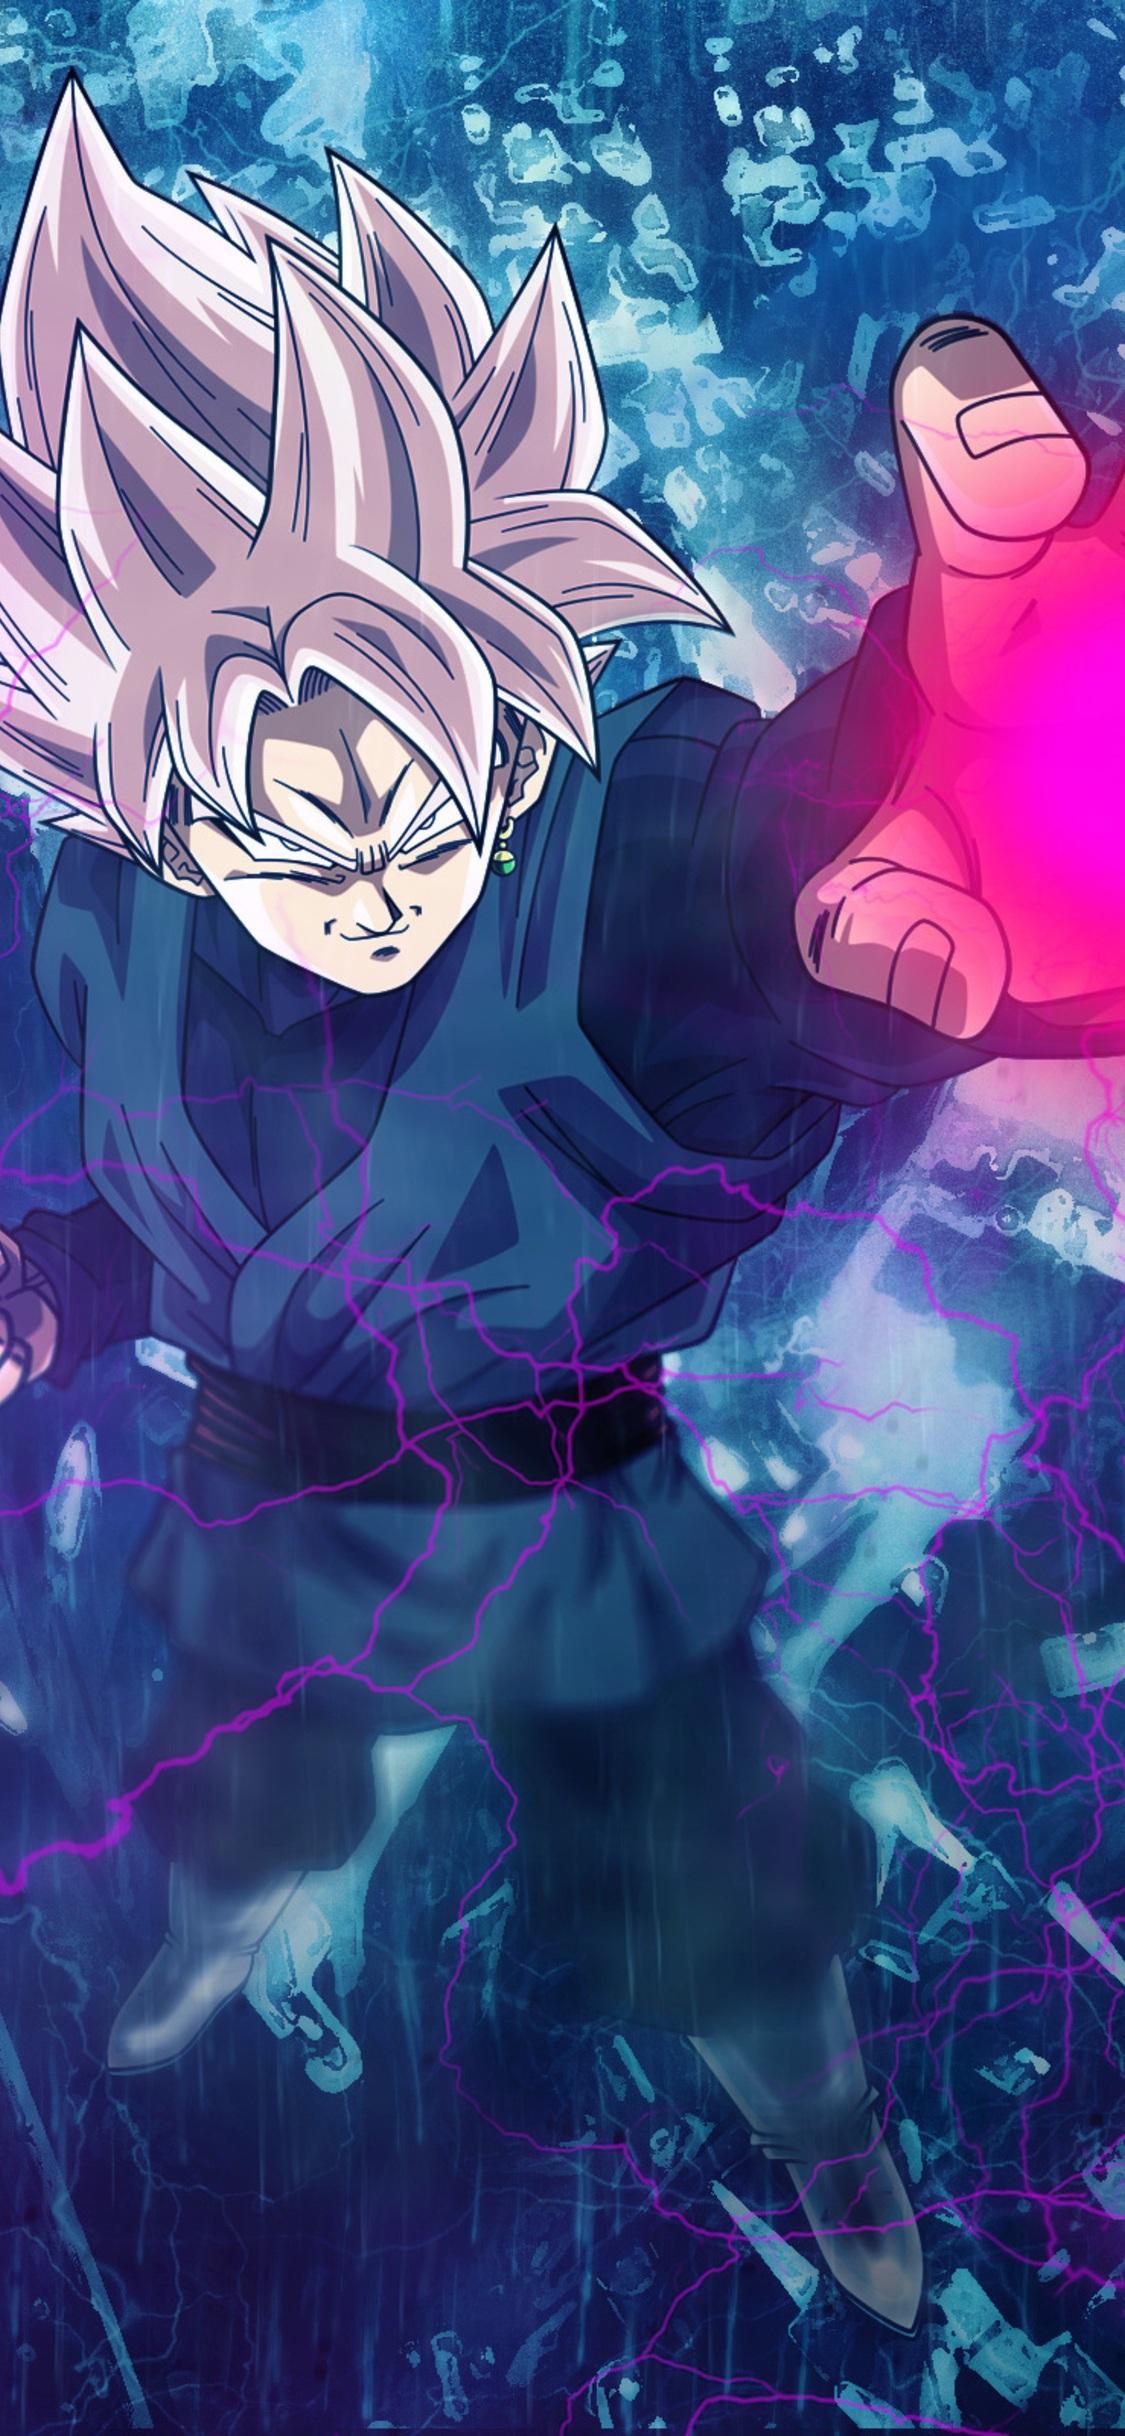 Dragon Ball Super Wallpaper Iphone X 2245729 Hd Wallpaper Backgrounds Download